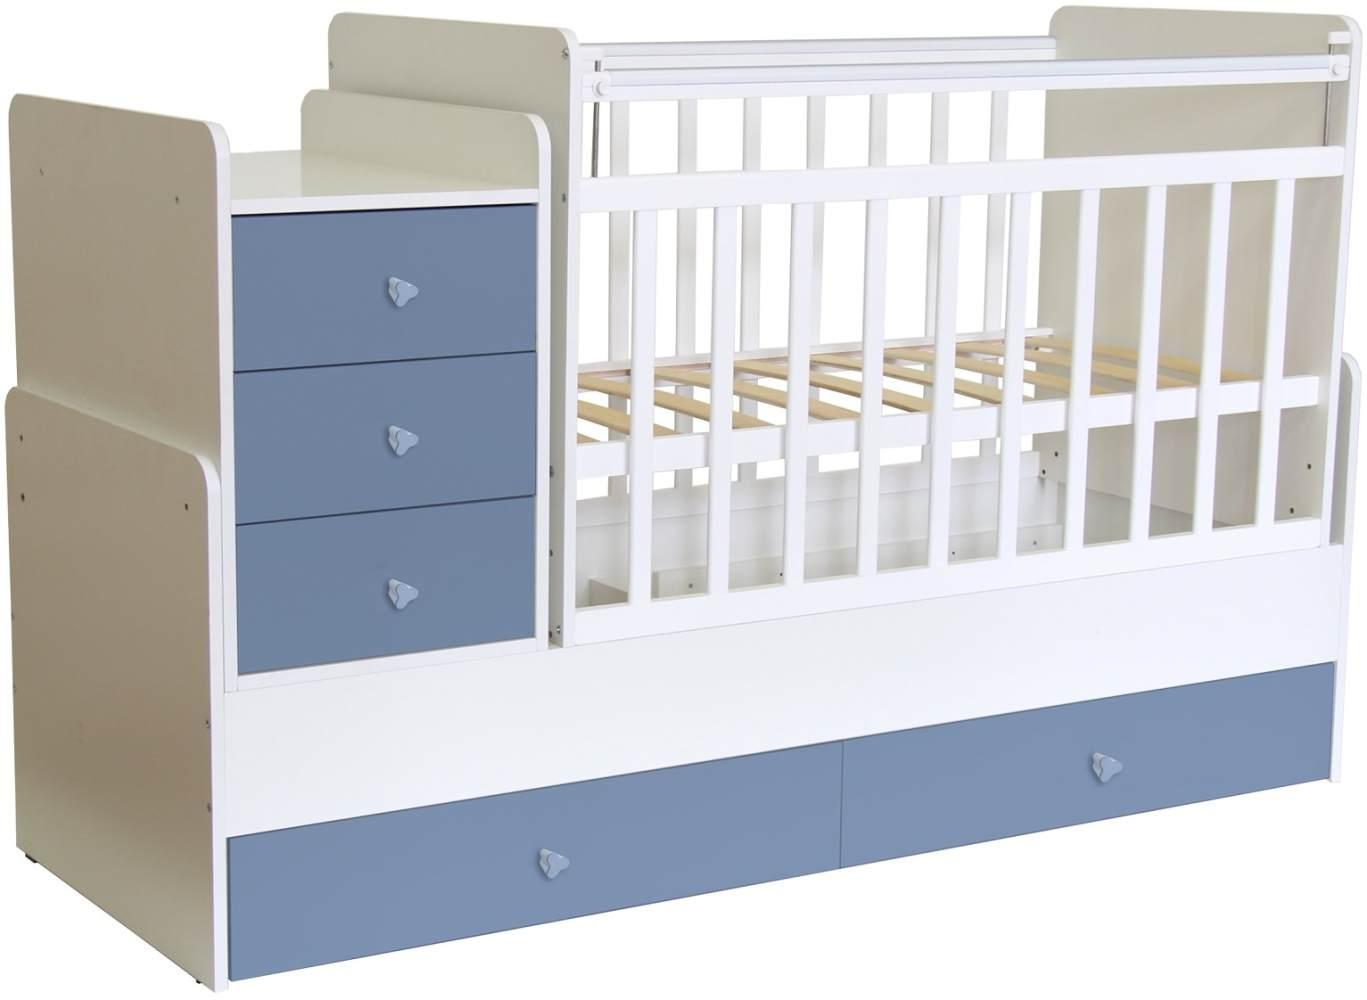 Polini Kids 'Simple 1100' Kombi-Kinderbett 60 x 120/170 cm, weiß/blau, höhenverstellbar, mit Schaukelfunktion, inkl. Kommode Bild 1